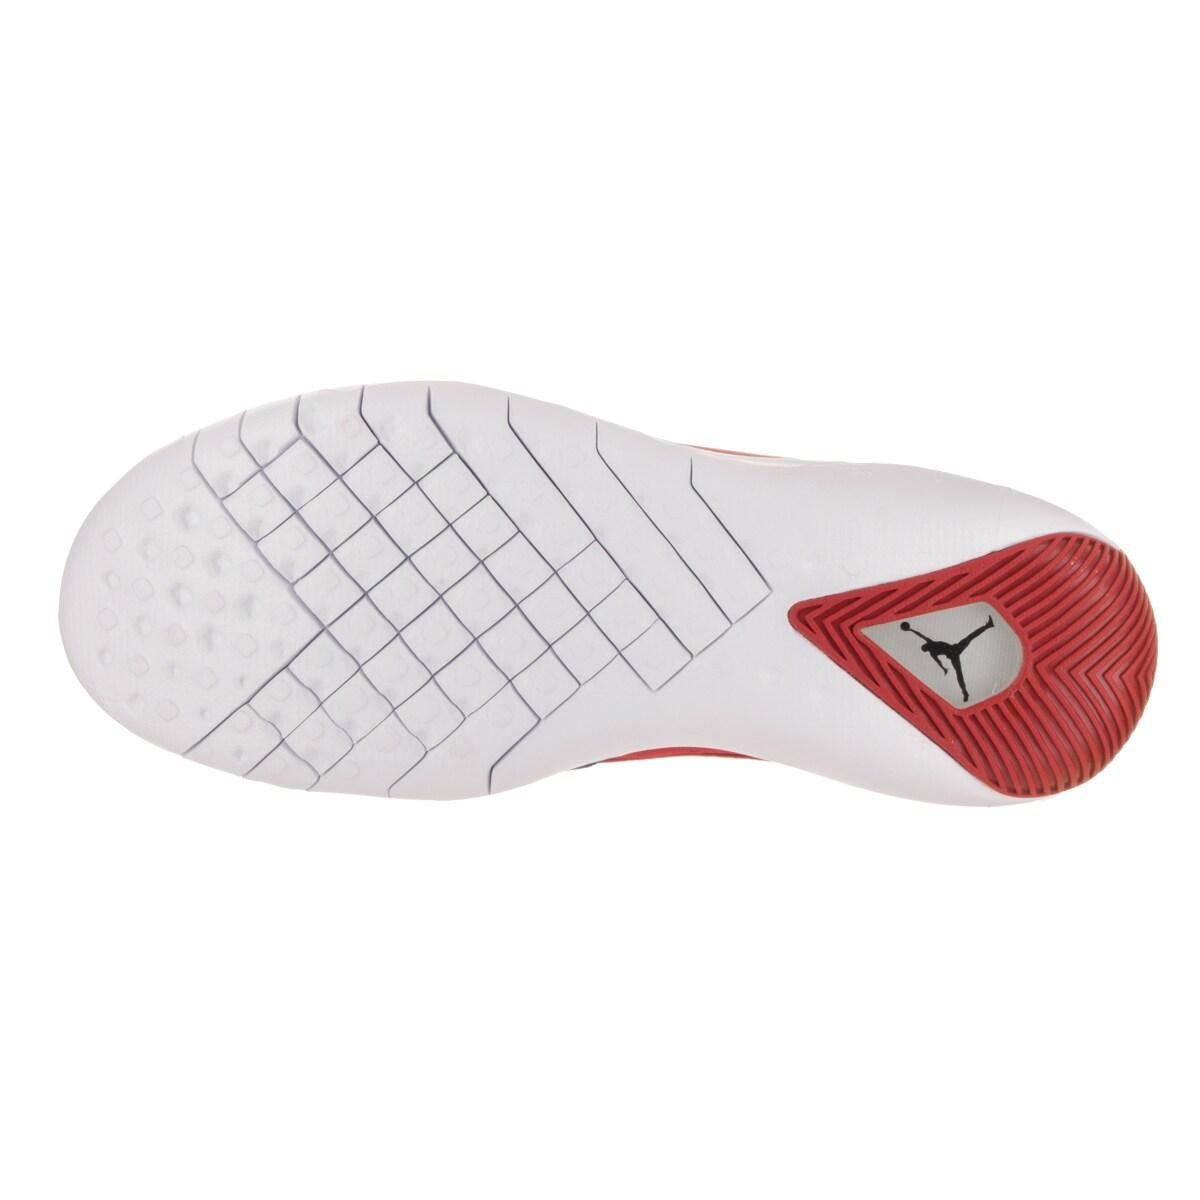 cheap for discount 7d253 d1a4b Shop Nike Jordan Men s Air Jordan 23 Breakout Basketball Shoe - Ships To  Canada - Overstock - 14676682